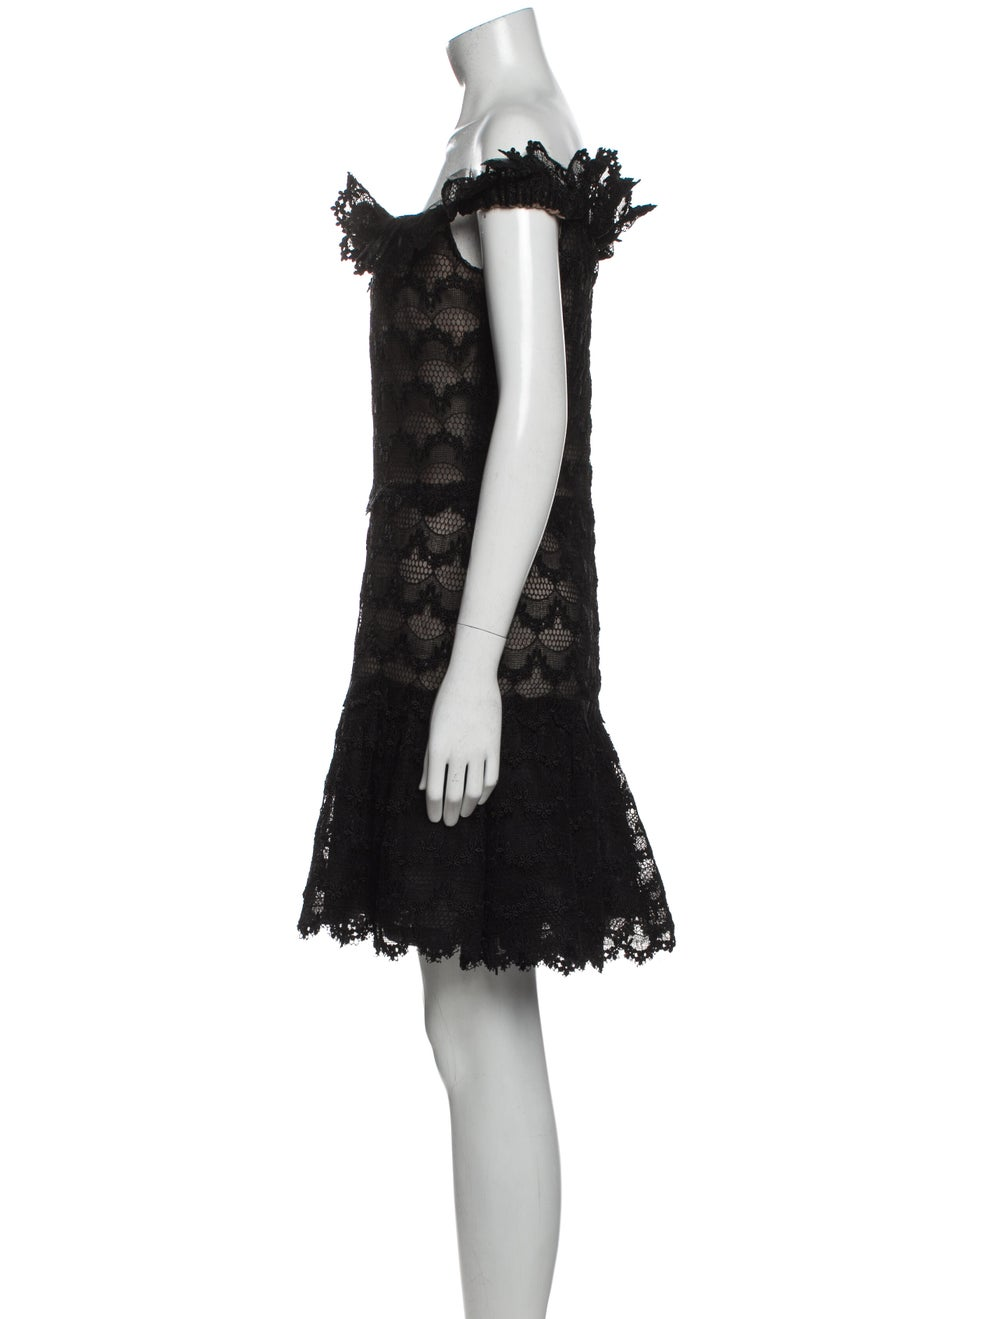 Arnold Scaasi Cowl Neck Mini Dress Black - image 2